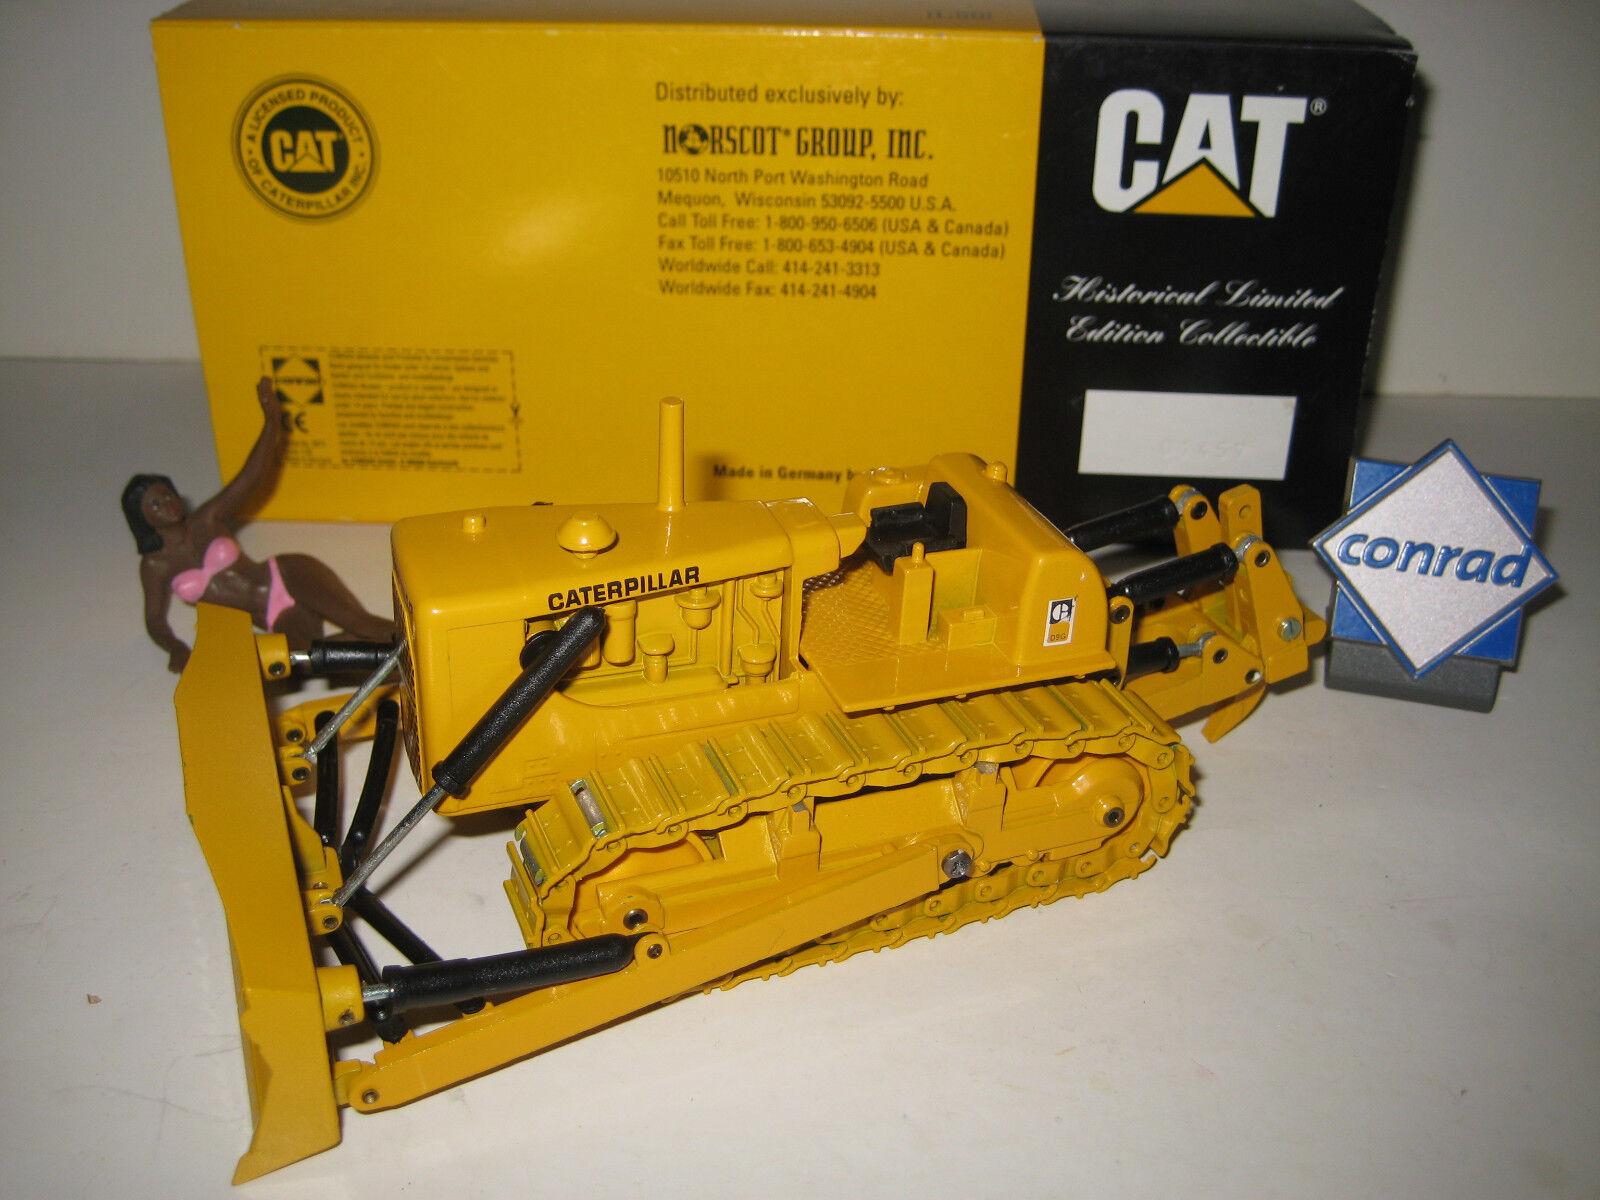 CATERPILLAR D 9 G PLANIERRAUPE RIPPER  2874.1 CONRAD 1 50 OVP  | Neuheit Spielzeug